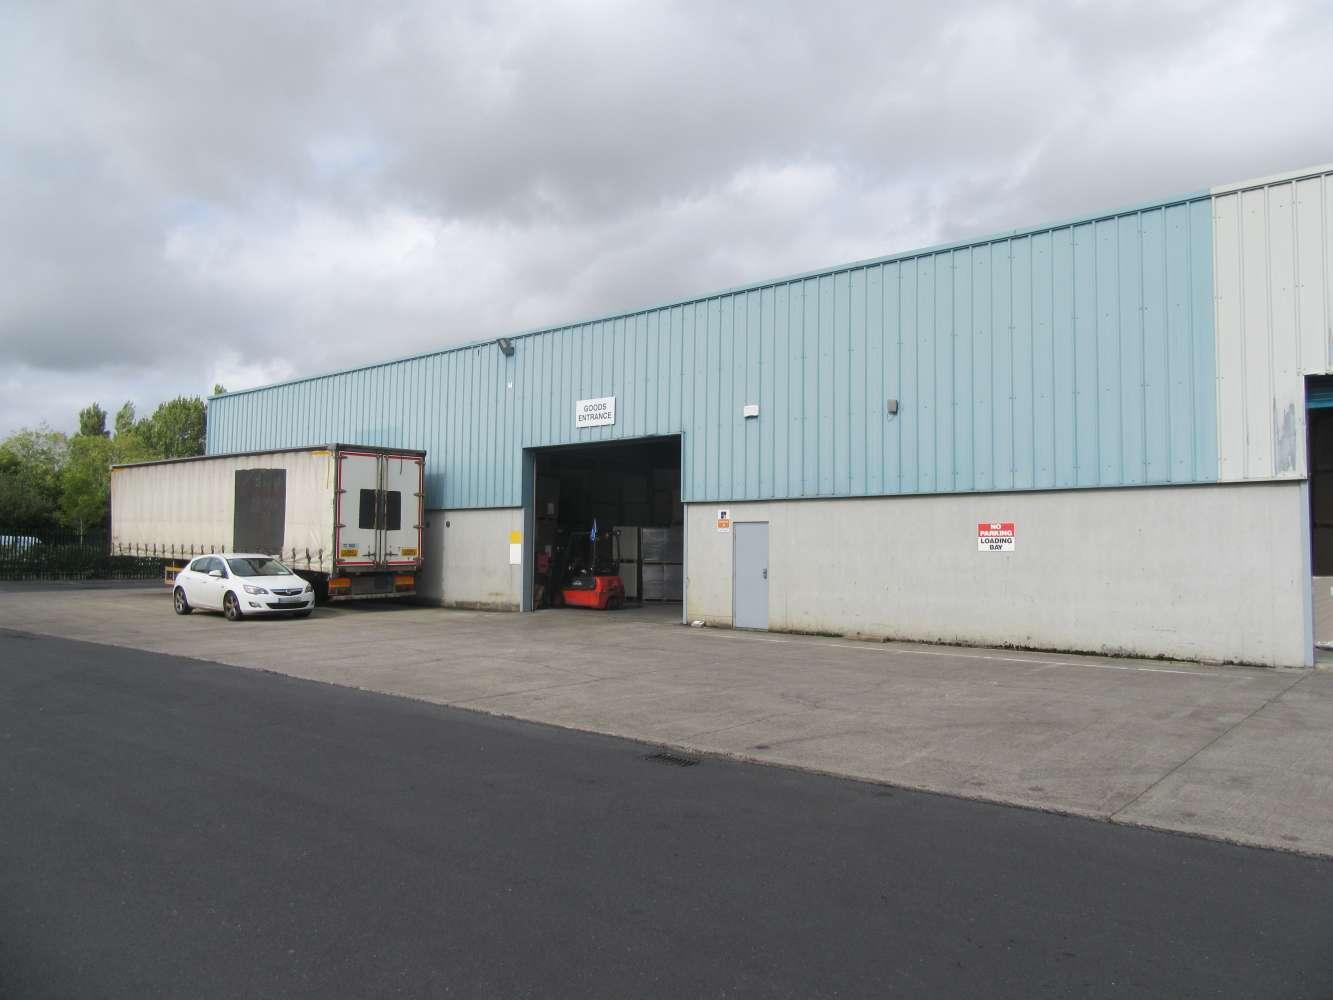 Industrial Co dublin, D24 PP28 - Units 1 - 4, Block L Greenogue Business Park